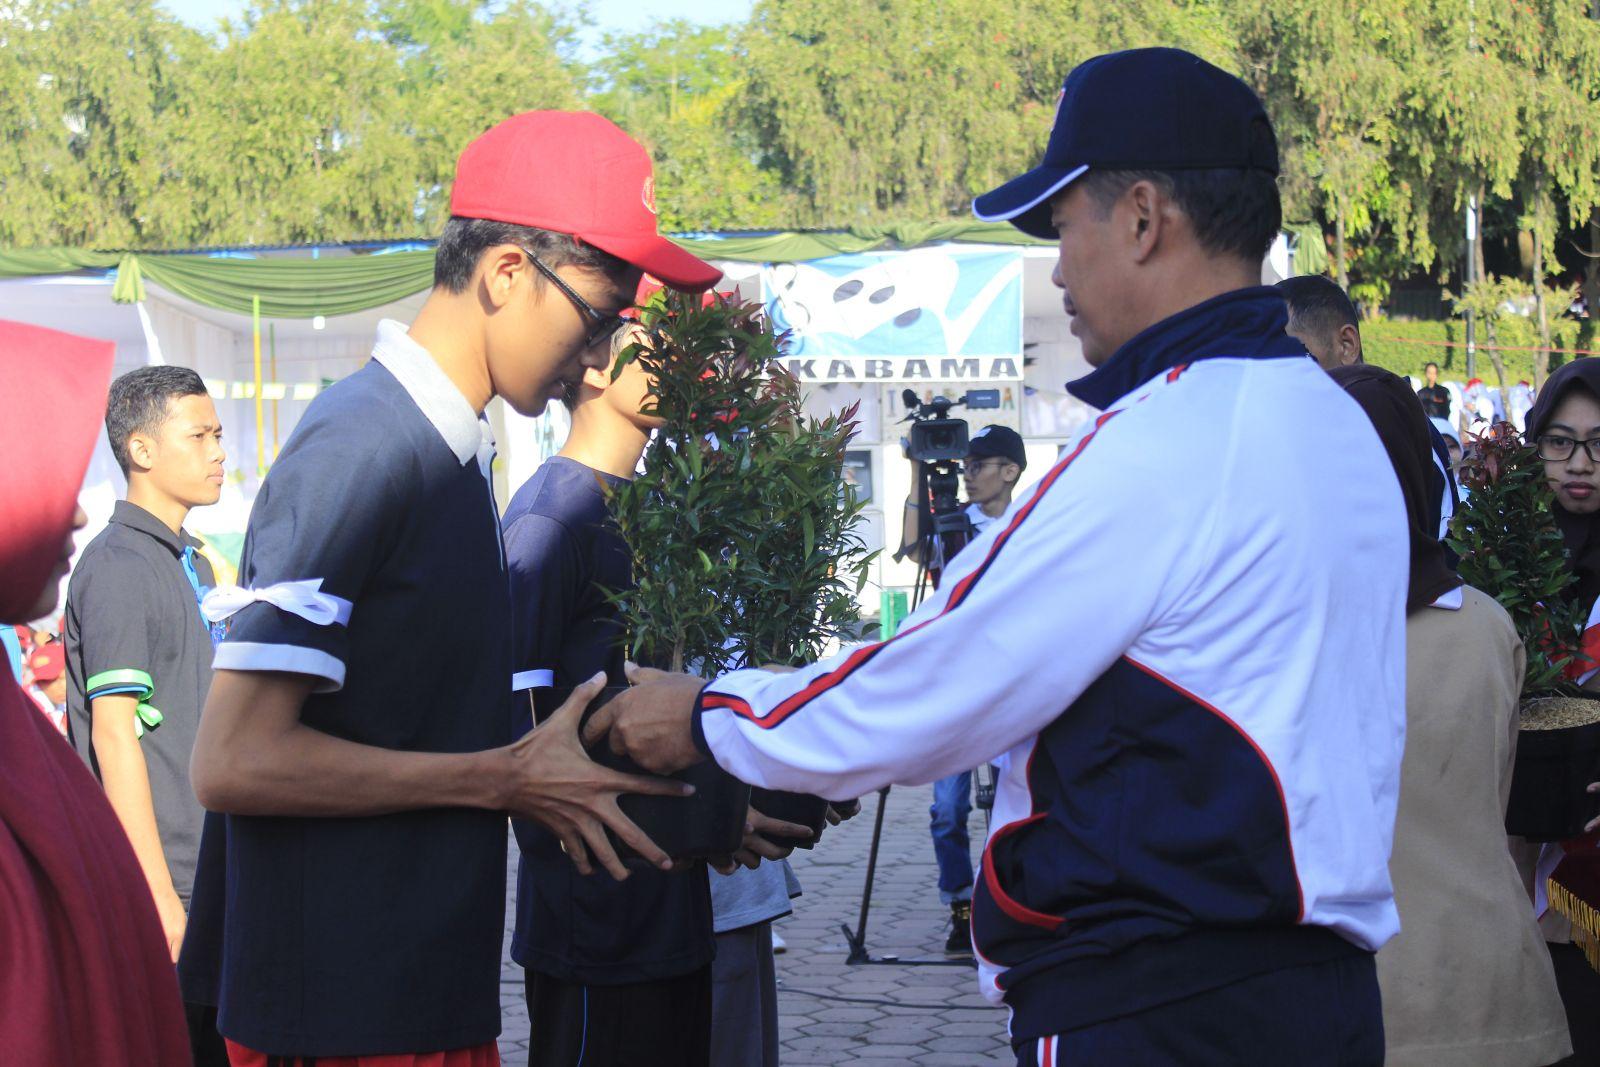 Simbolis: Rektor UMM fauzan menyerahkan tanaman kepada salah satu perwakilan mahasiswa peserta student day 2016 di heilpad UMM (Desita/Bestari)